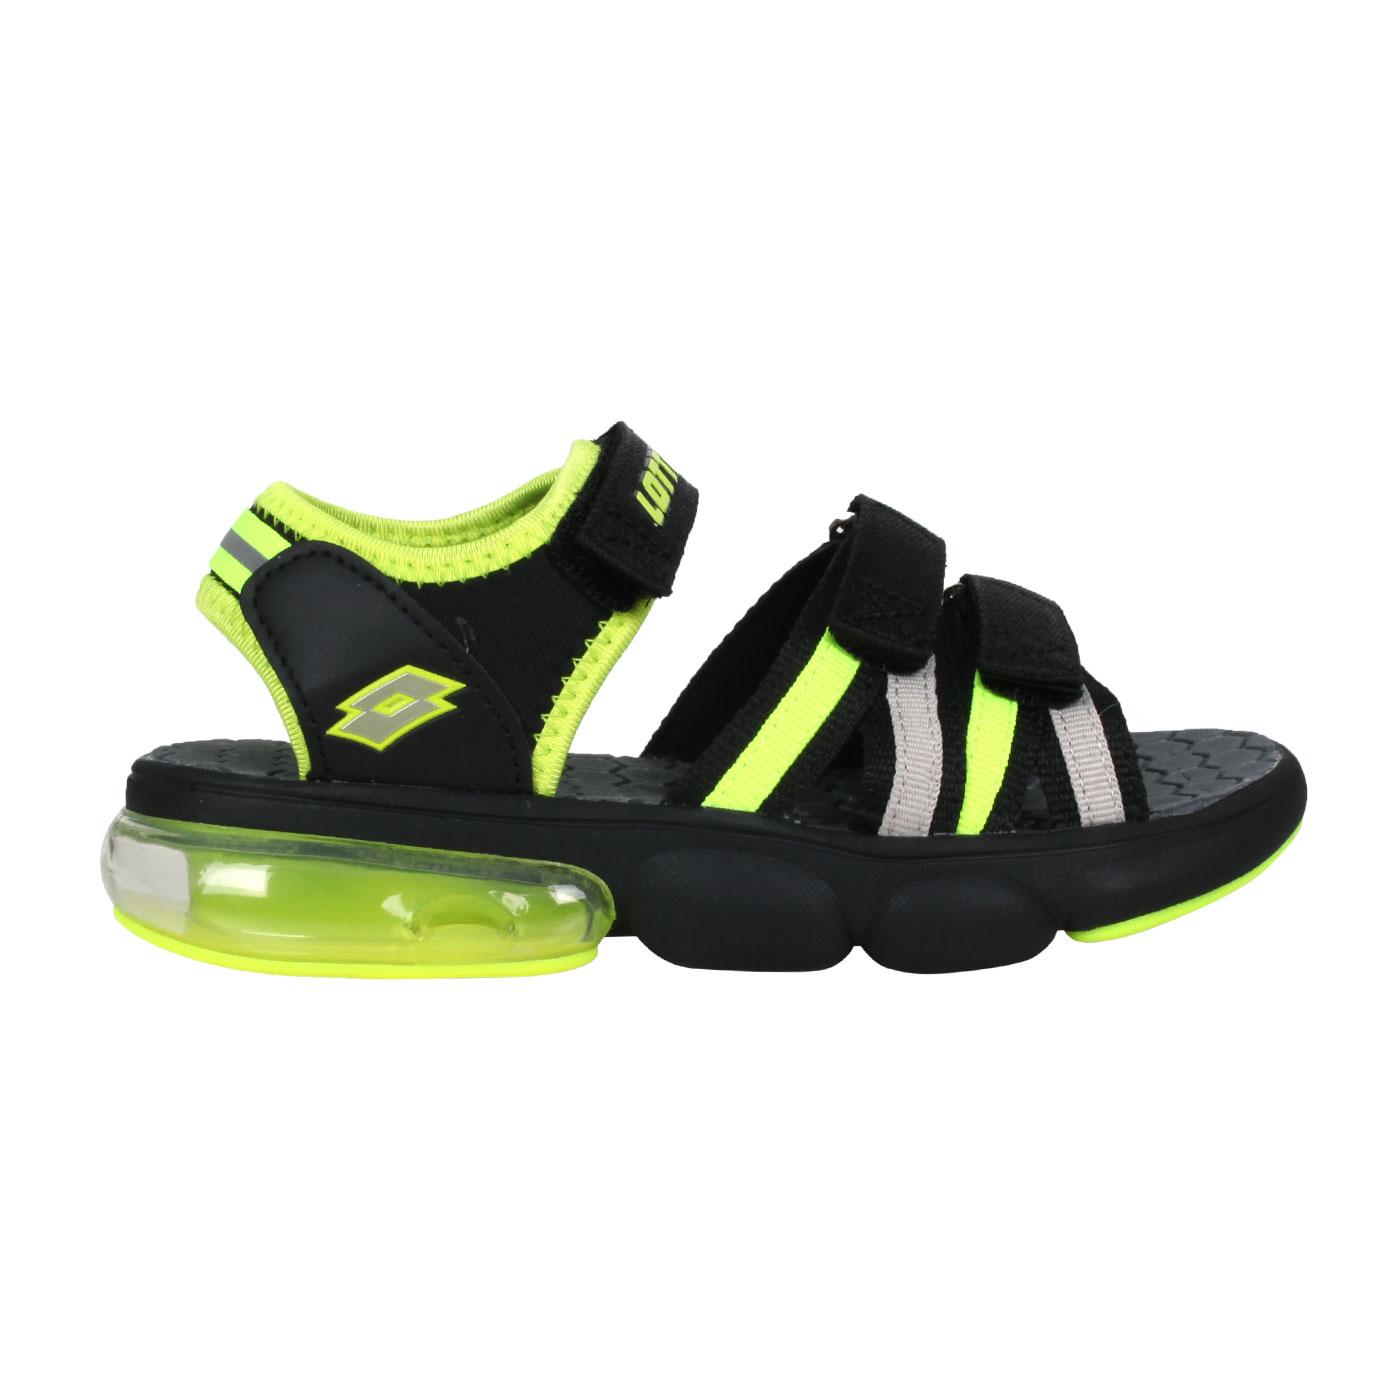 LOTTO 大童織帶氣墊涼鞋 LT1AKS3200 - 螢光黃黑